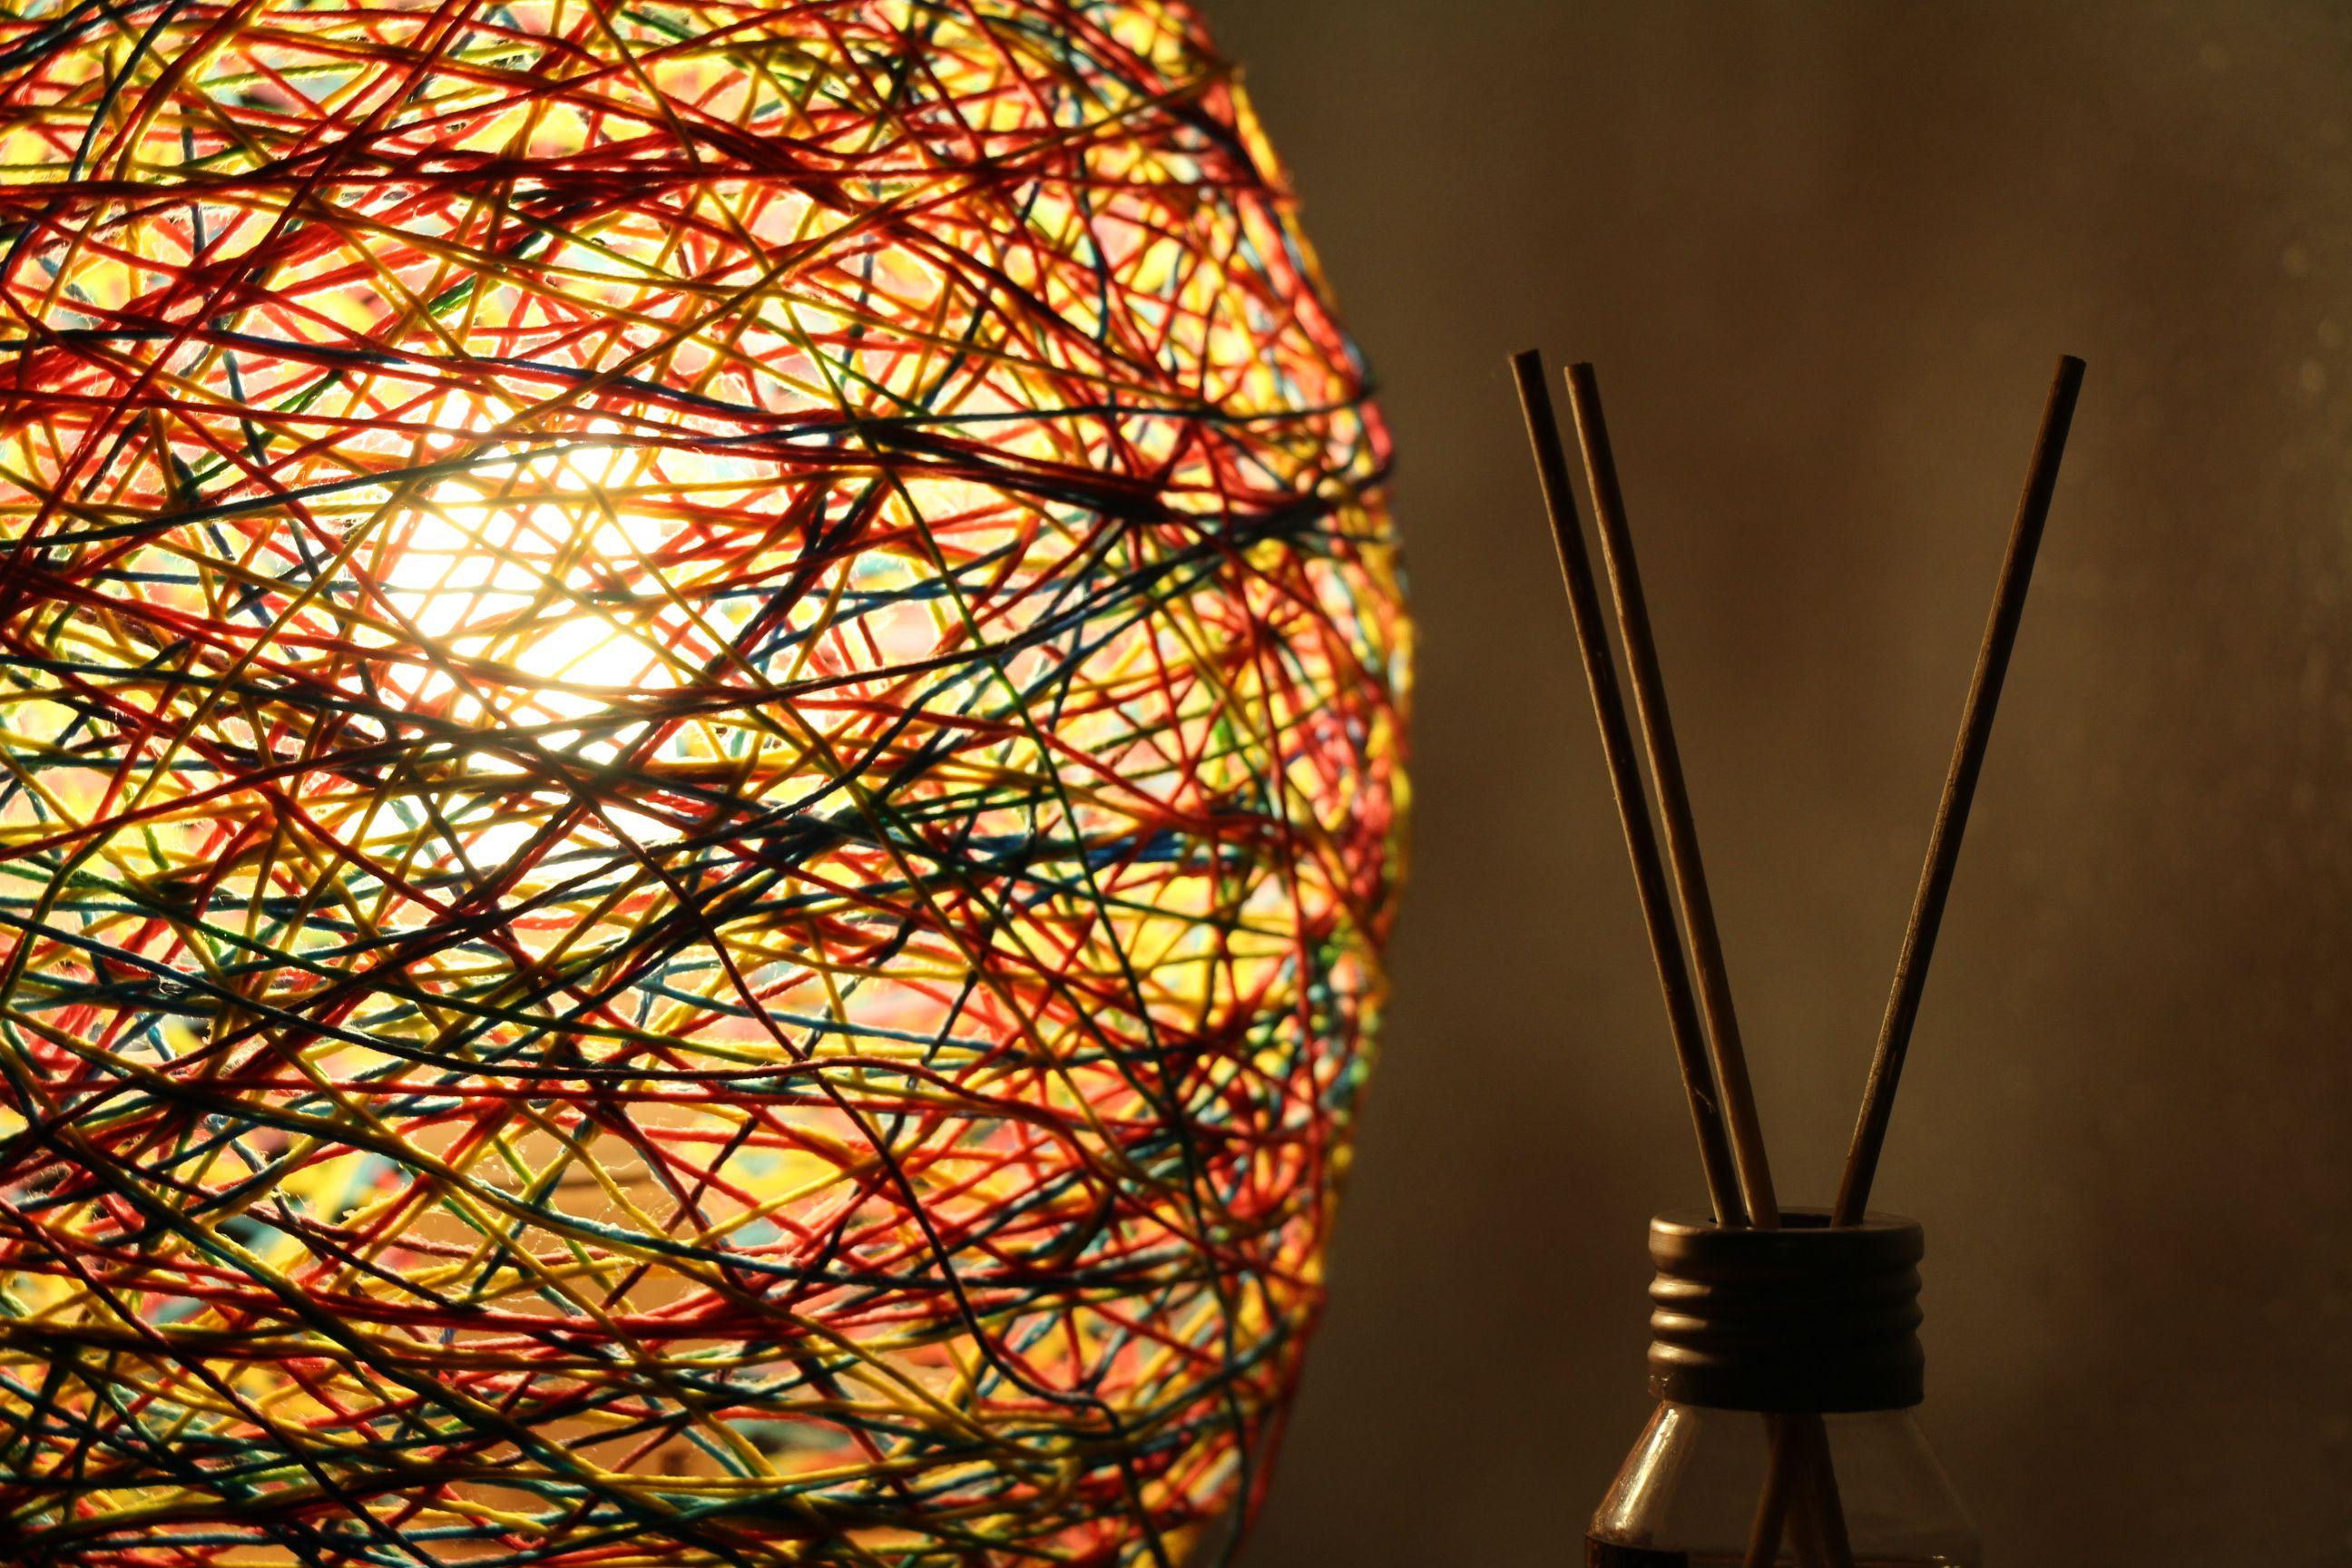 Abajur Emaranhado de Fios & Abajur Emaranhado de Fios | Take DIY | Pinterest azcodes.com